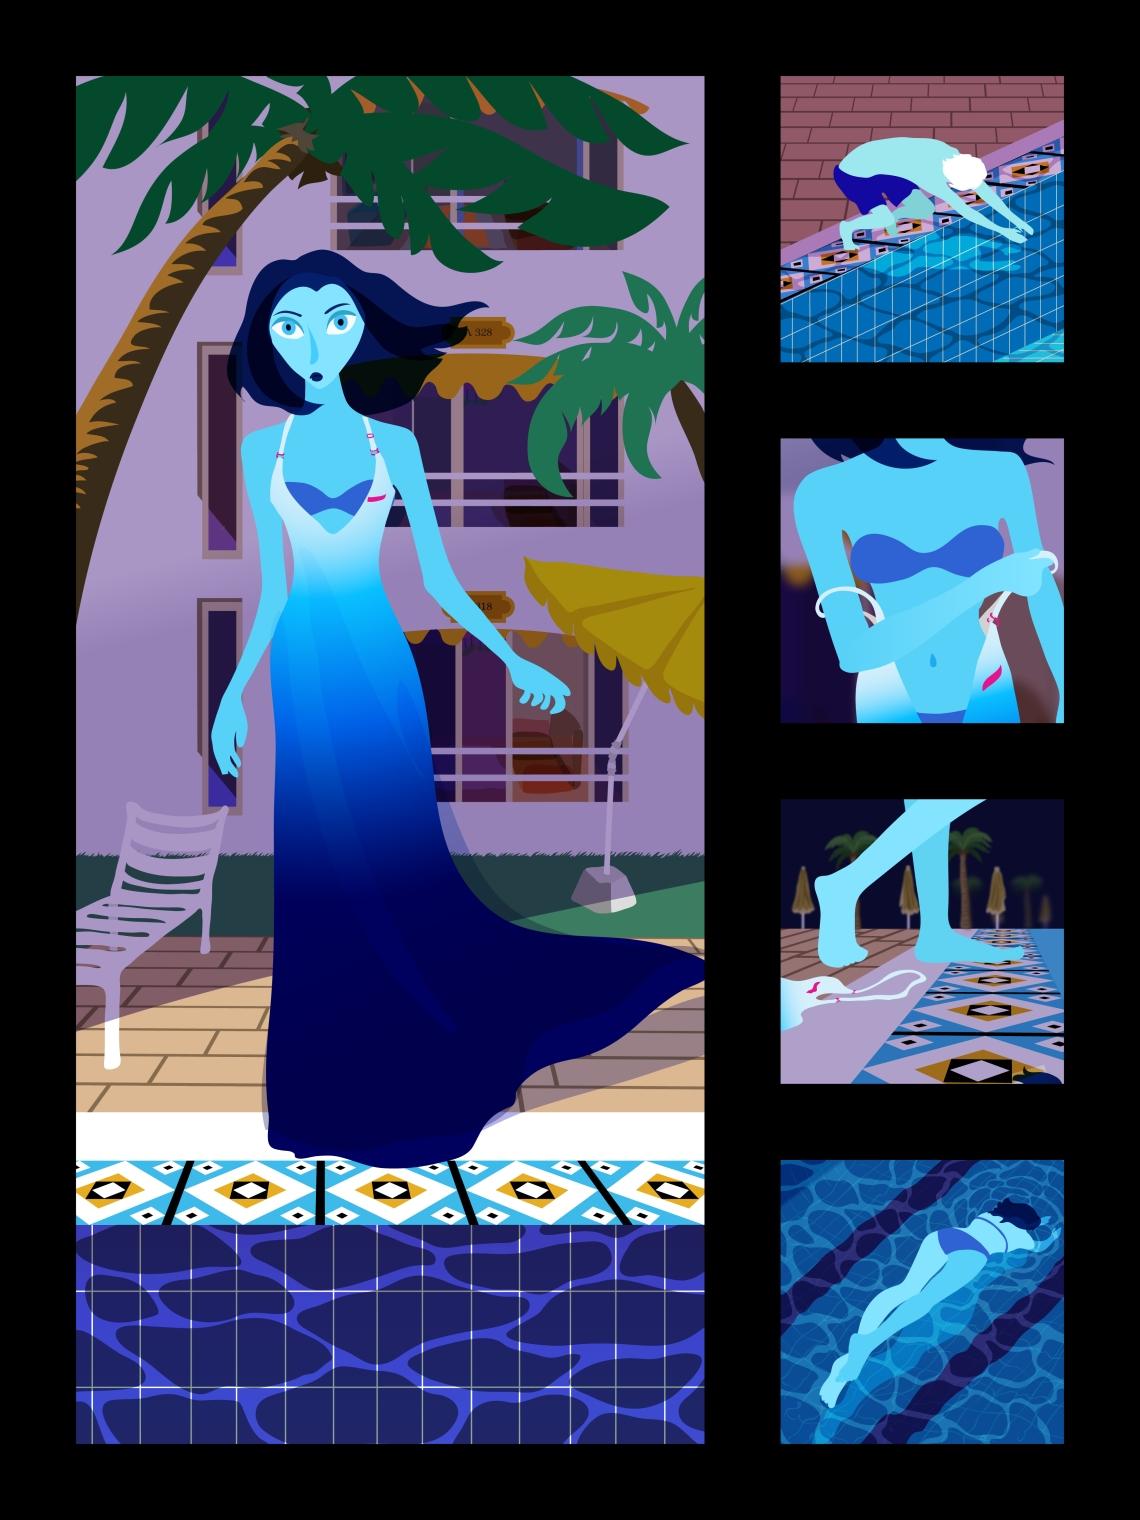 mélodie bloo Rosane Chawi pool scene swim dive woman bikini palm trees